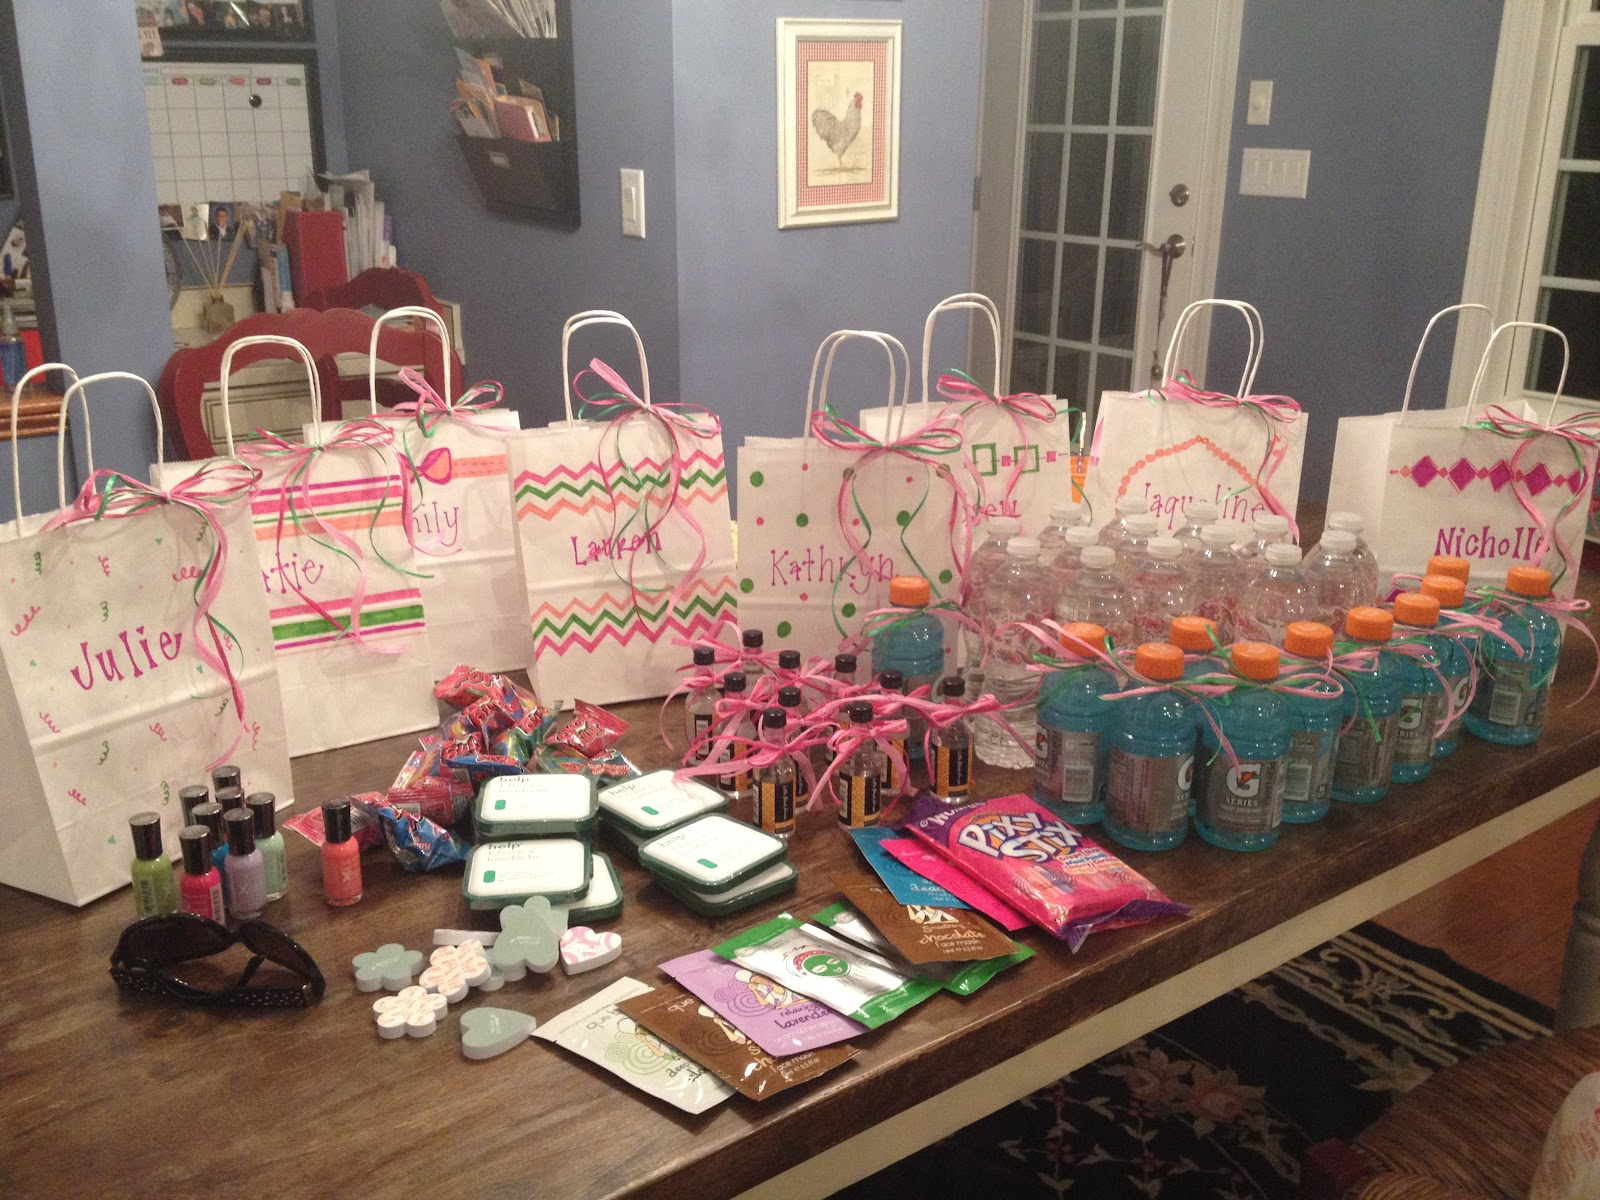 Preppy Kates Bachelorette Party Goodie Bags